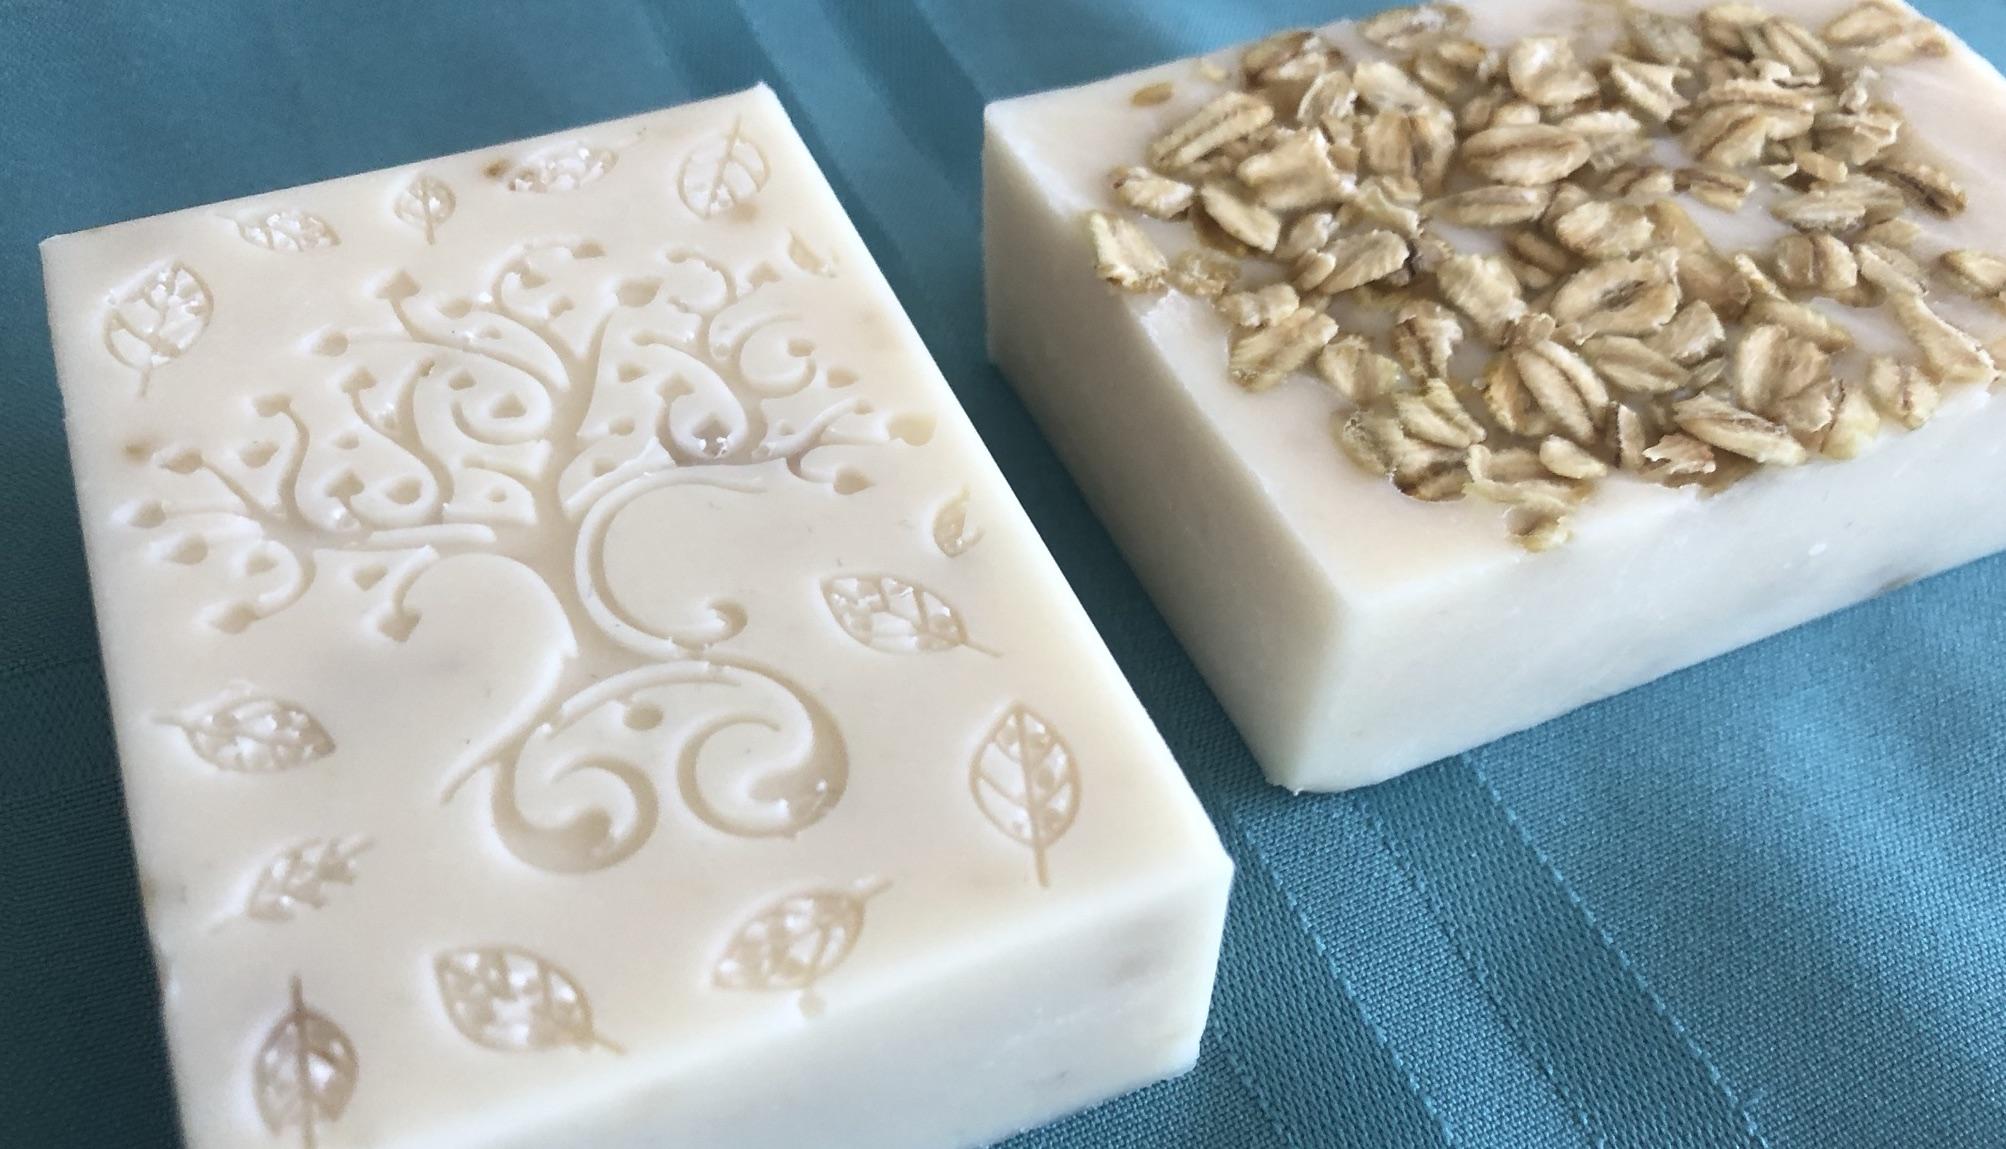 Soap Pic Oatmeal.jpeg